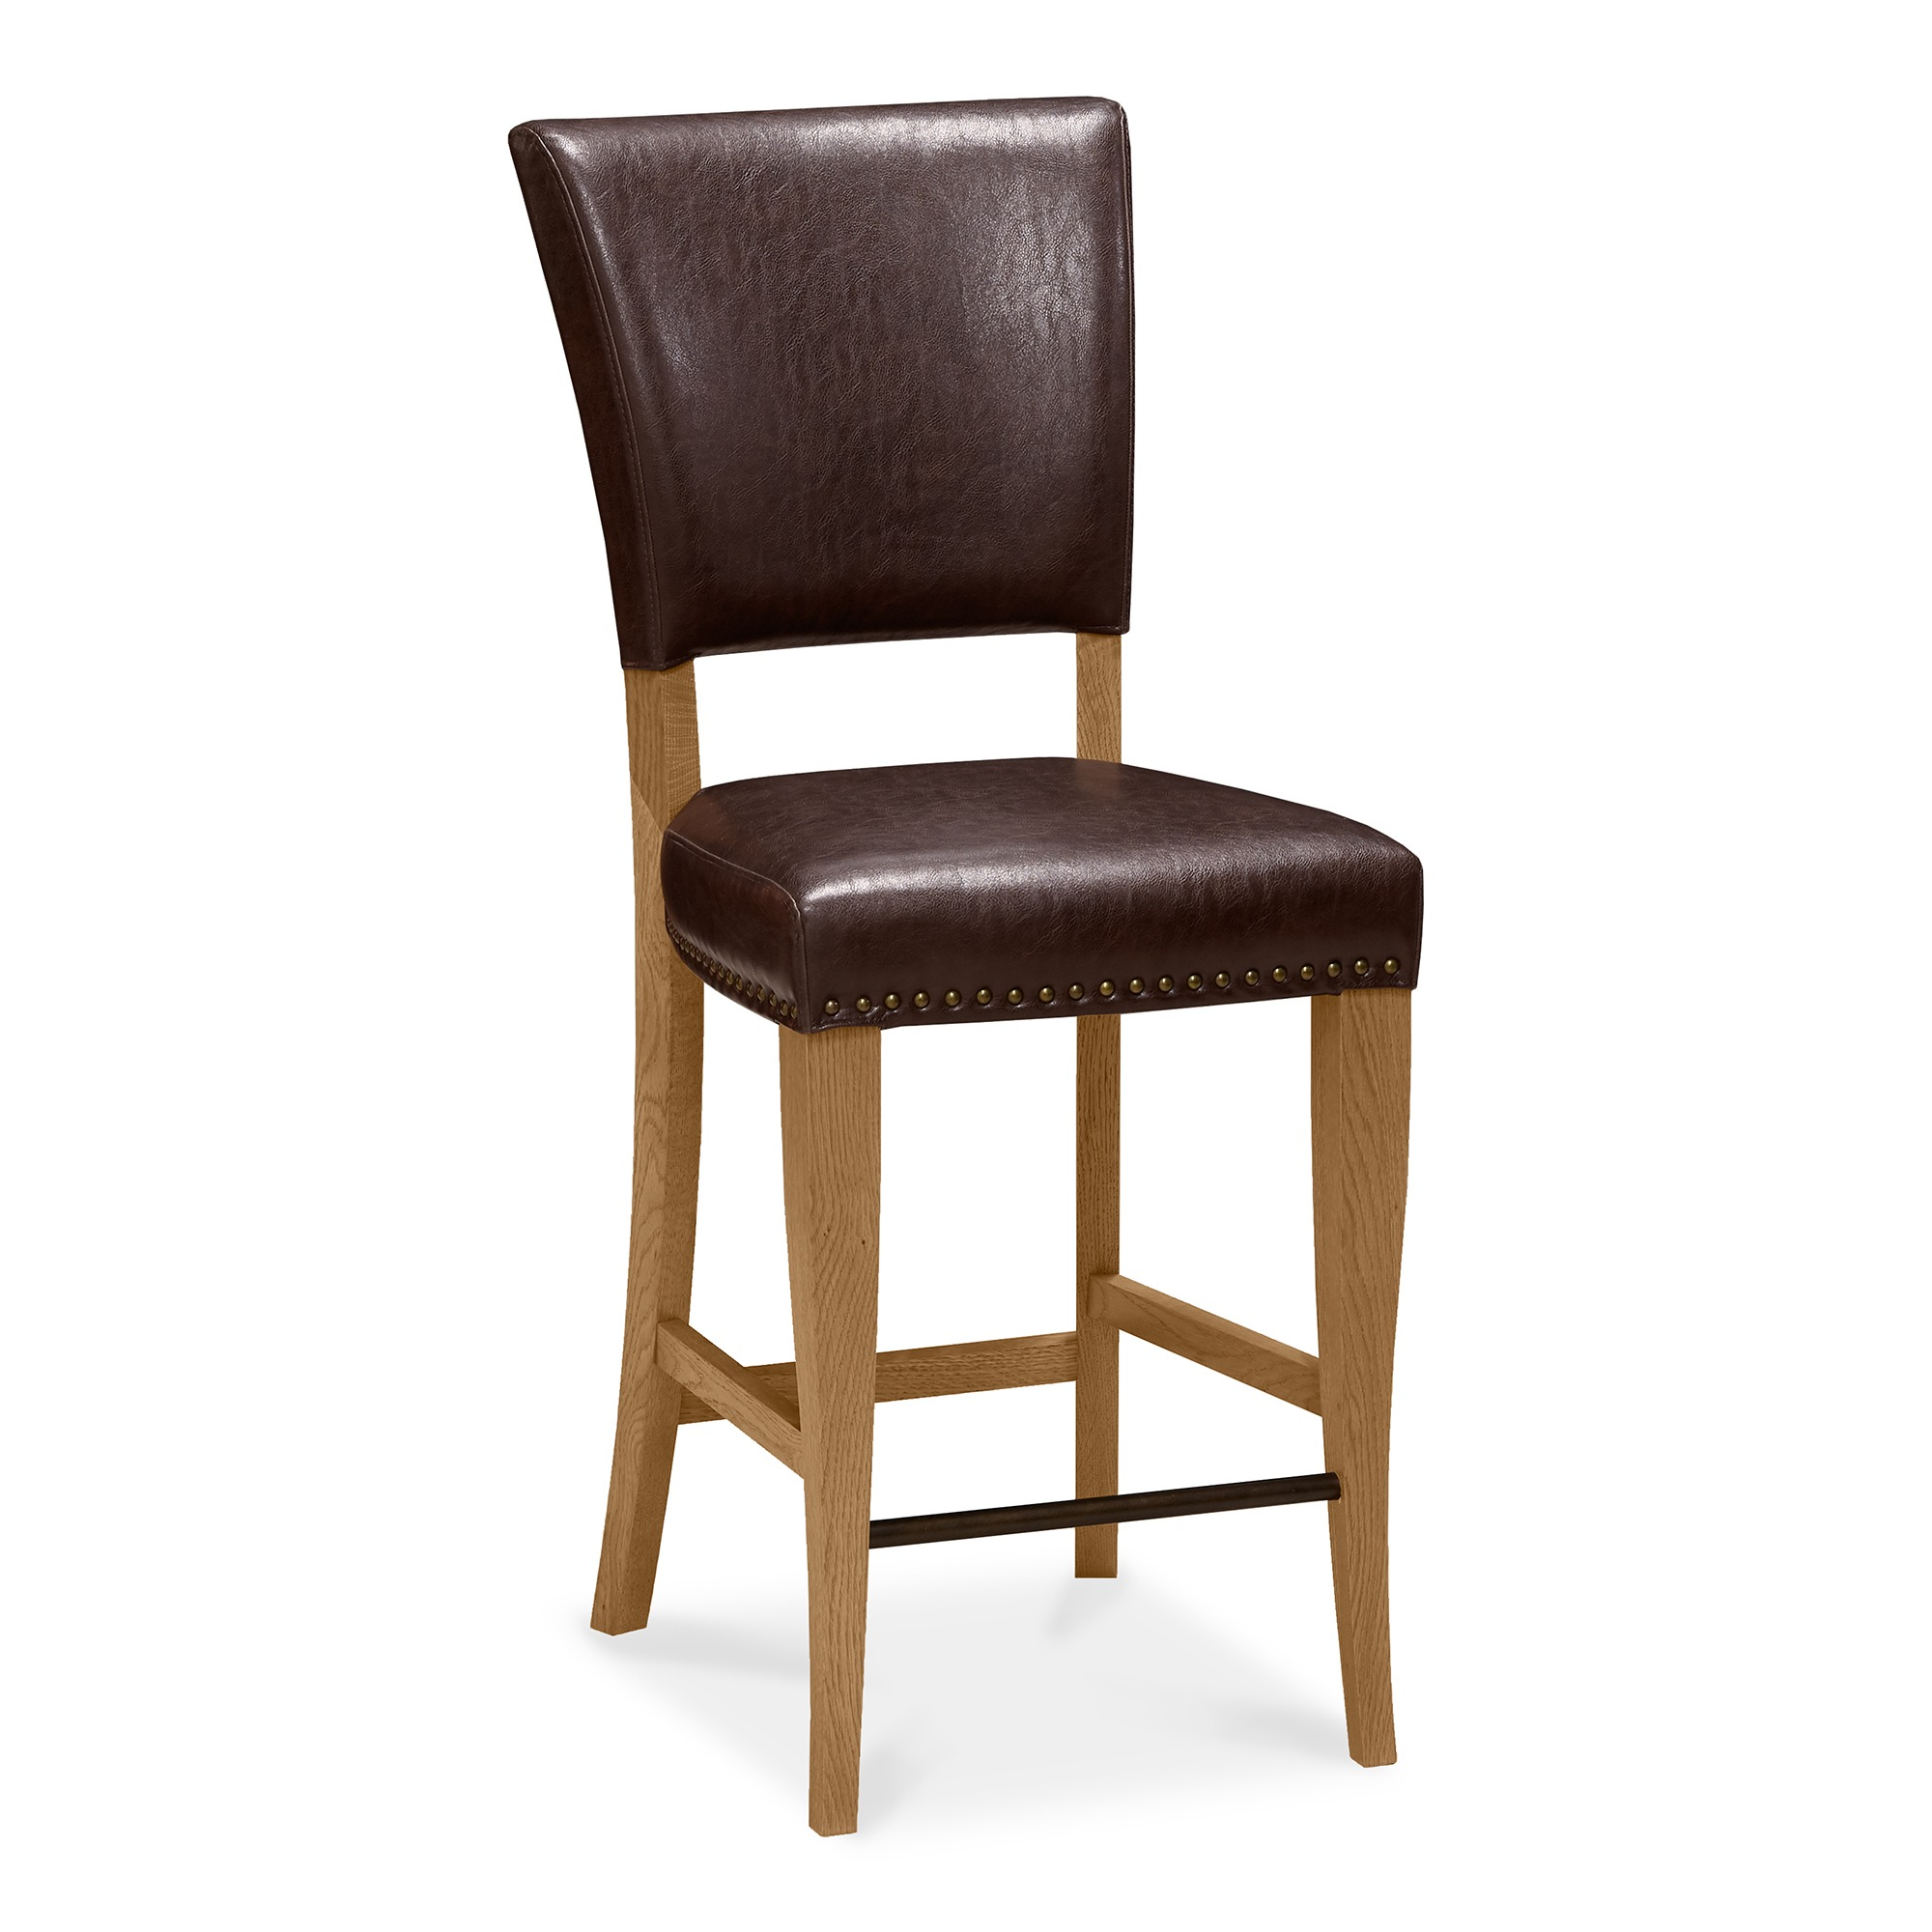 Lisbon Brown leather and oak bar stool